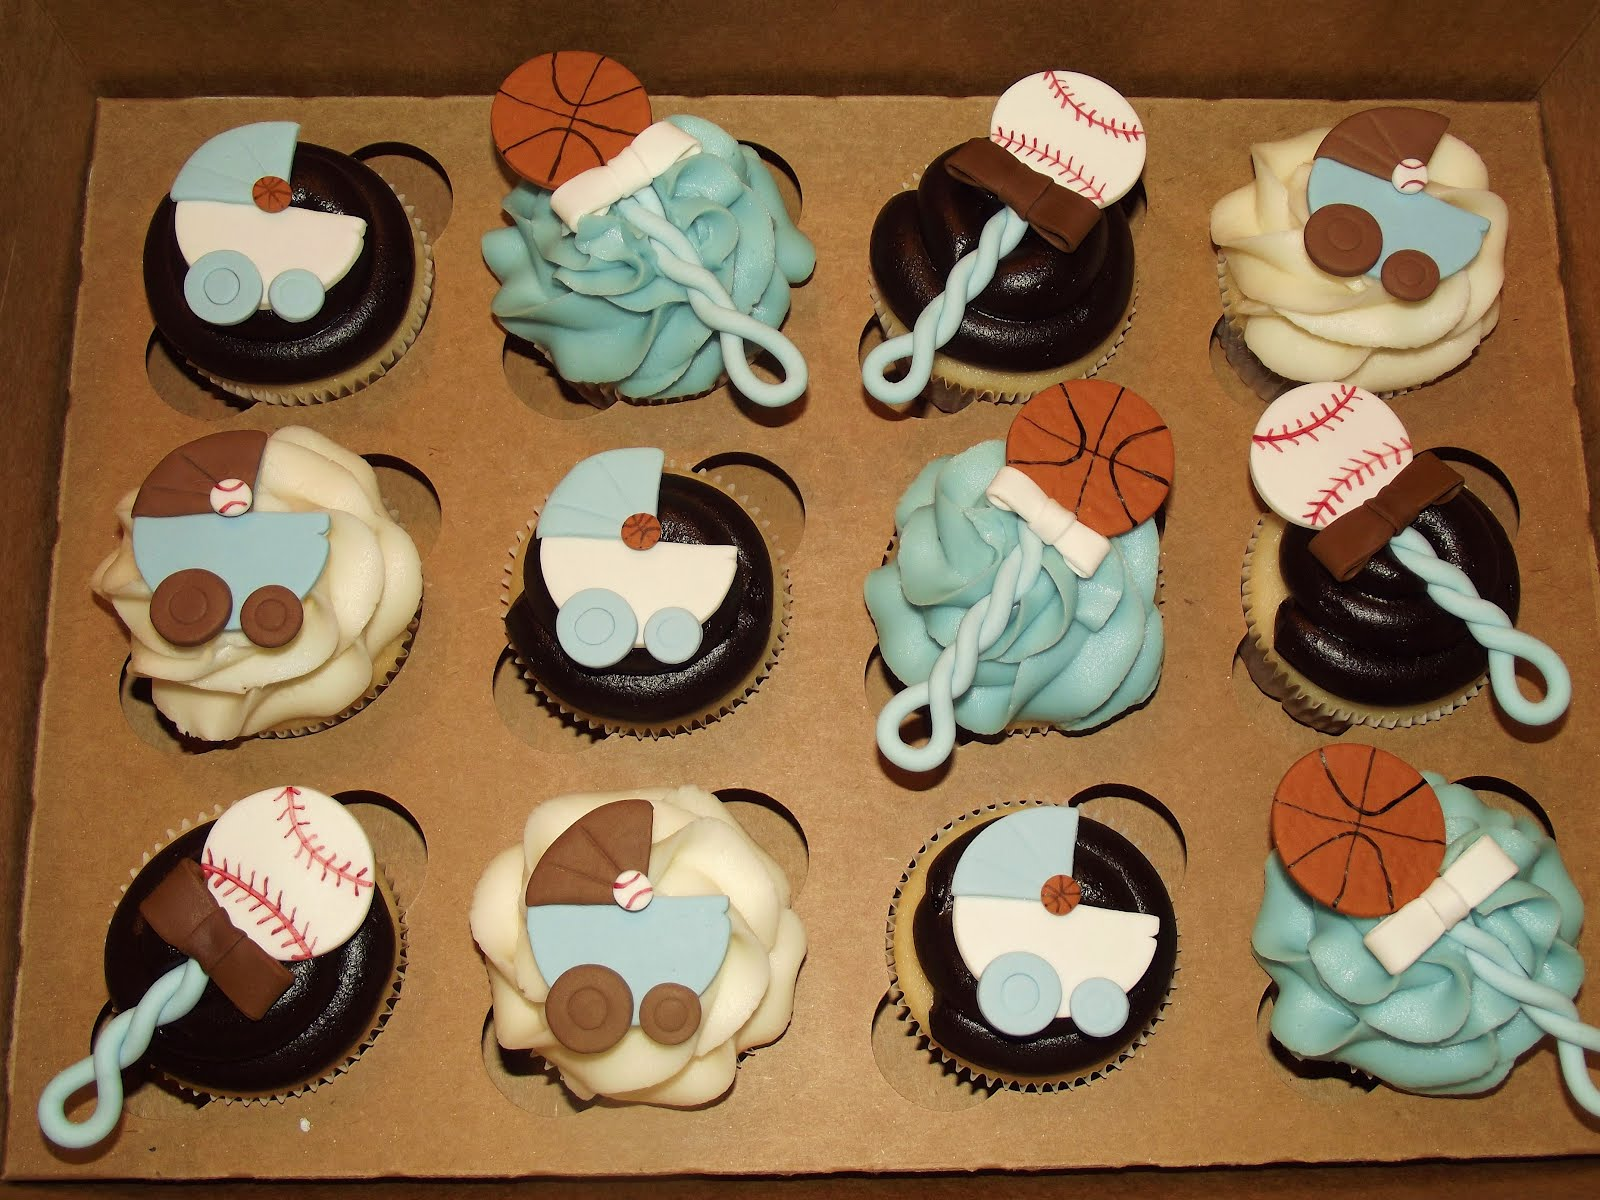 Baby Shower Ideas Cupcake Themed : Suzy s Sweet Shoppe: September 2012